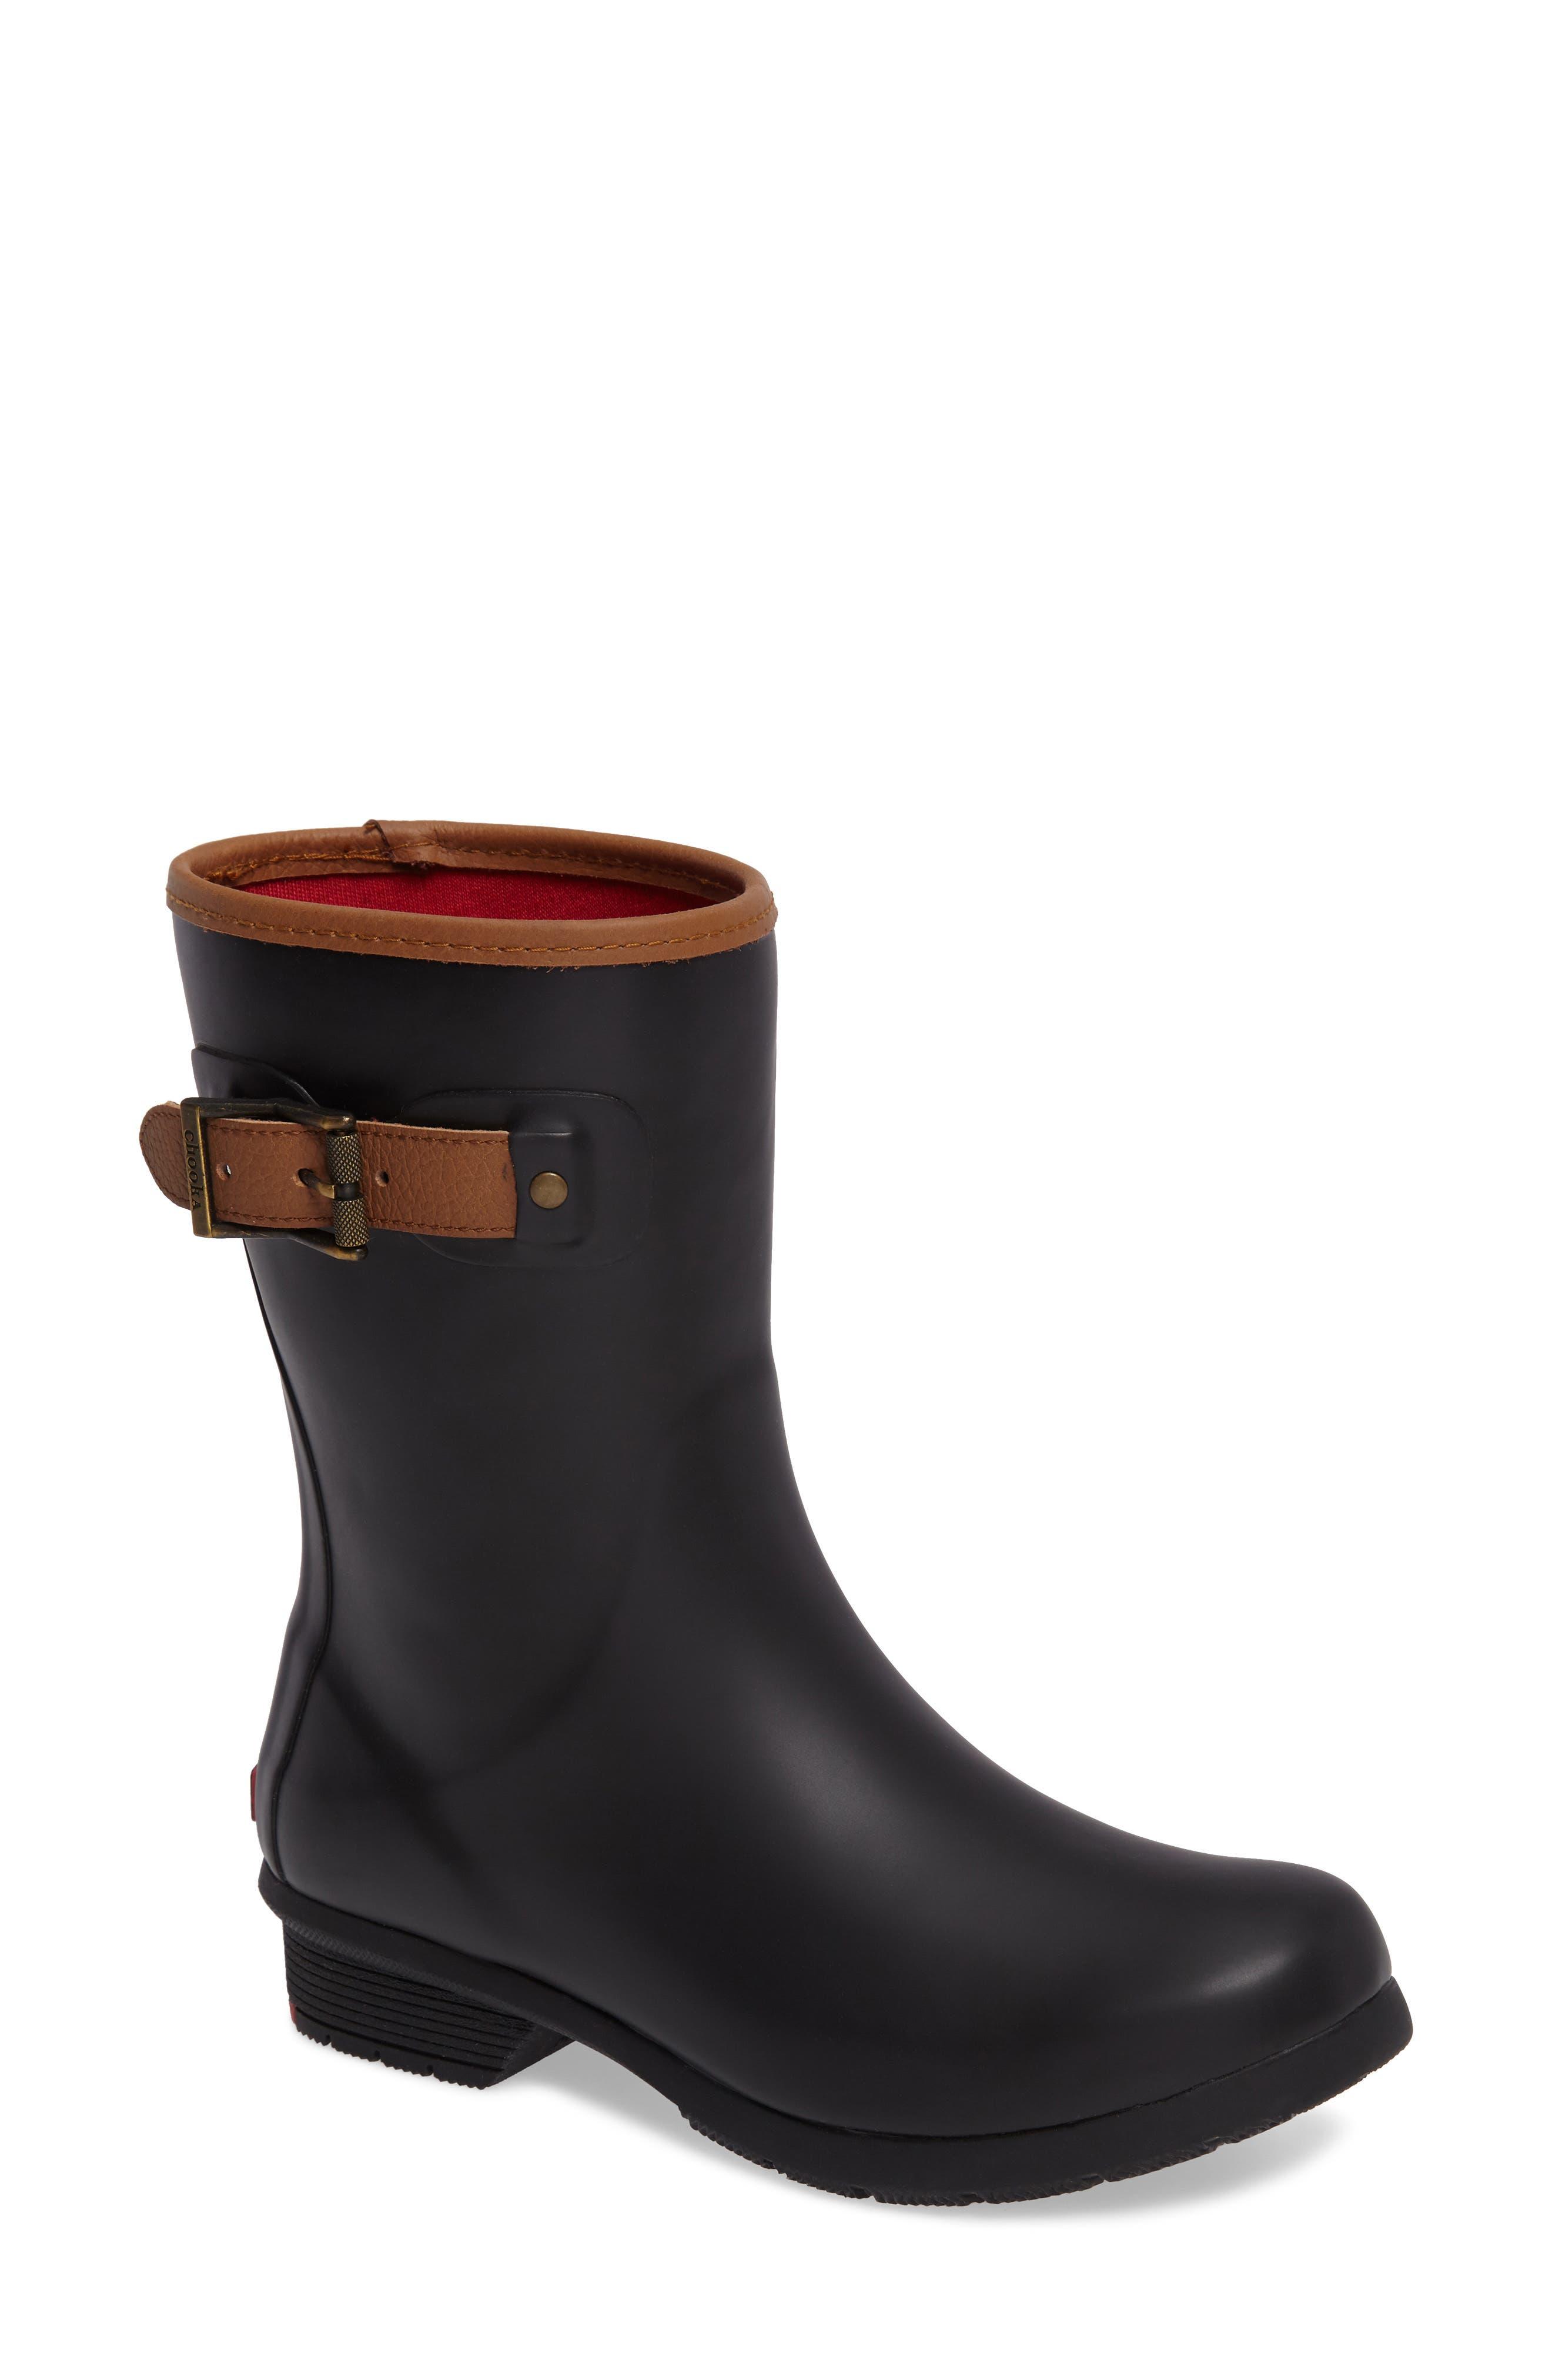 Image of Chooka City Solid Mid Height Rain Boot